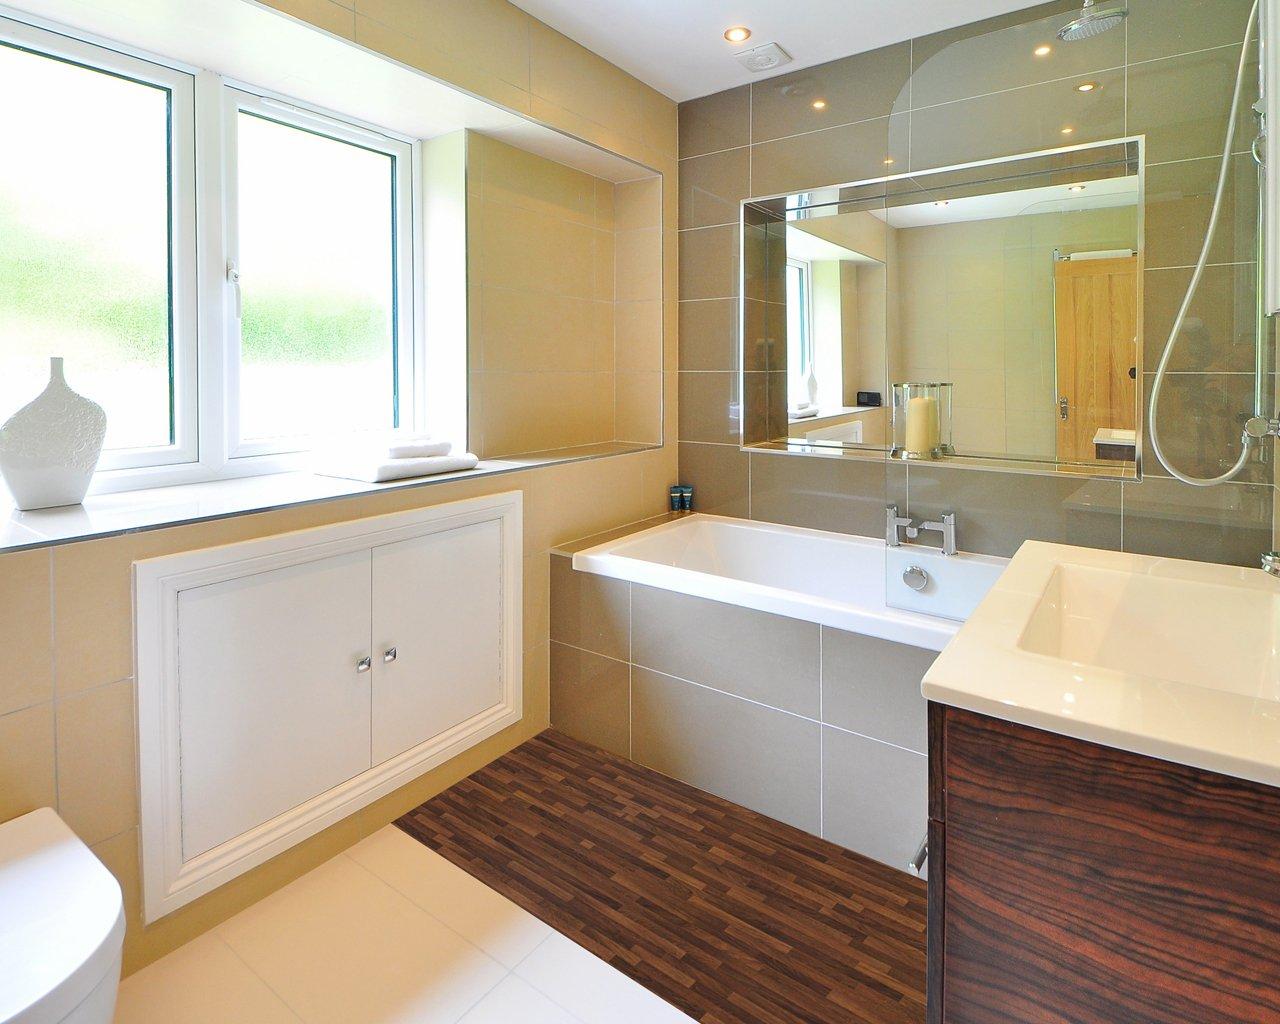 ChasBete Non-Slip Kitchen Floor Mat Slip Resistant Home Hallway Bathroom Runner Indoor Carpet Outside Door Rug Thin Cushioned Waterproof Heavy Duty Sticker(Wood Grain) by ChasBete (Image #6)